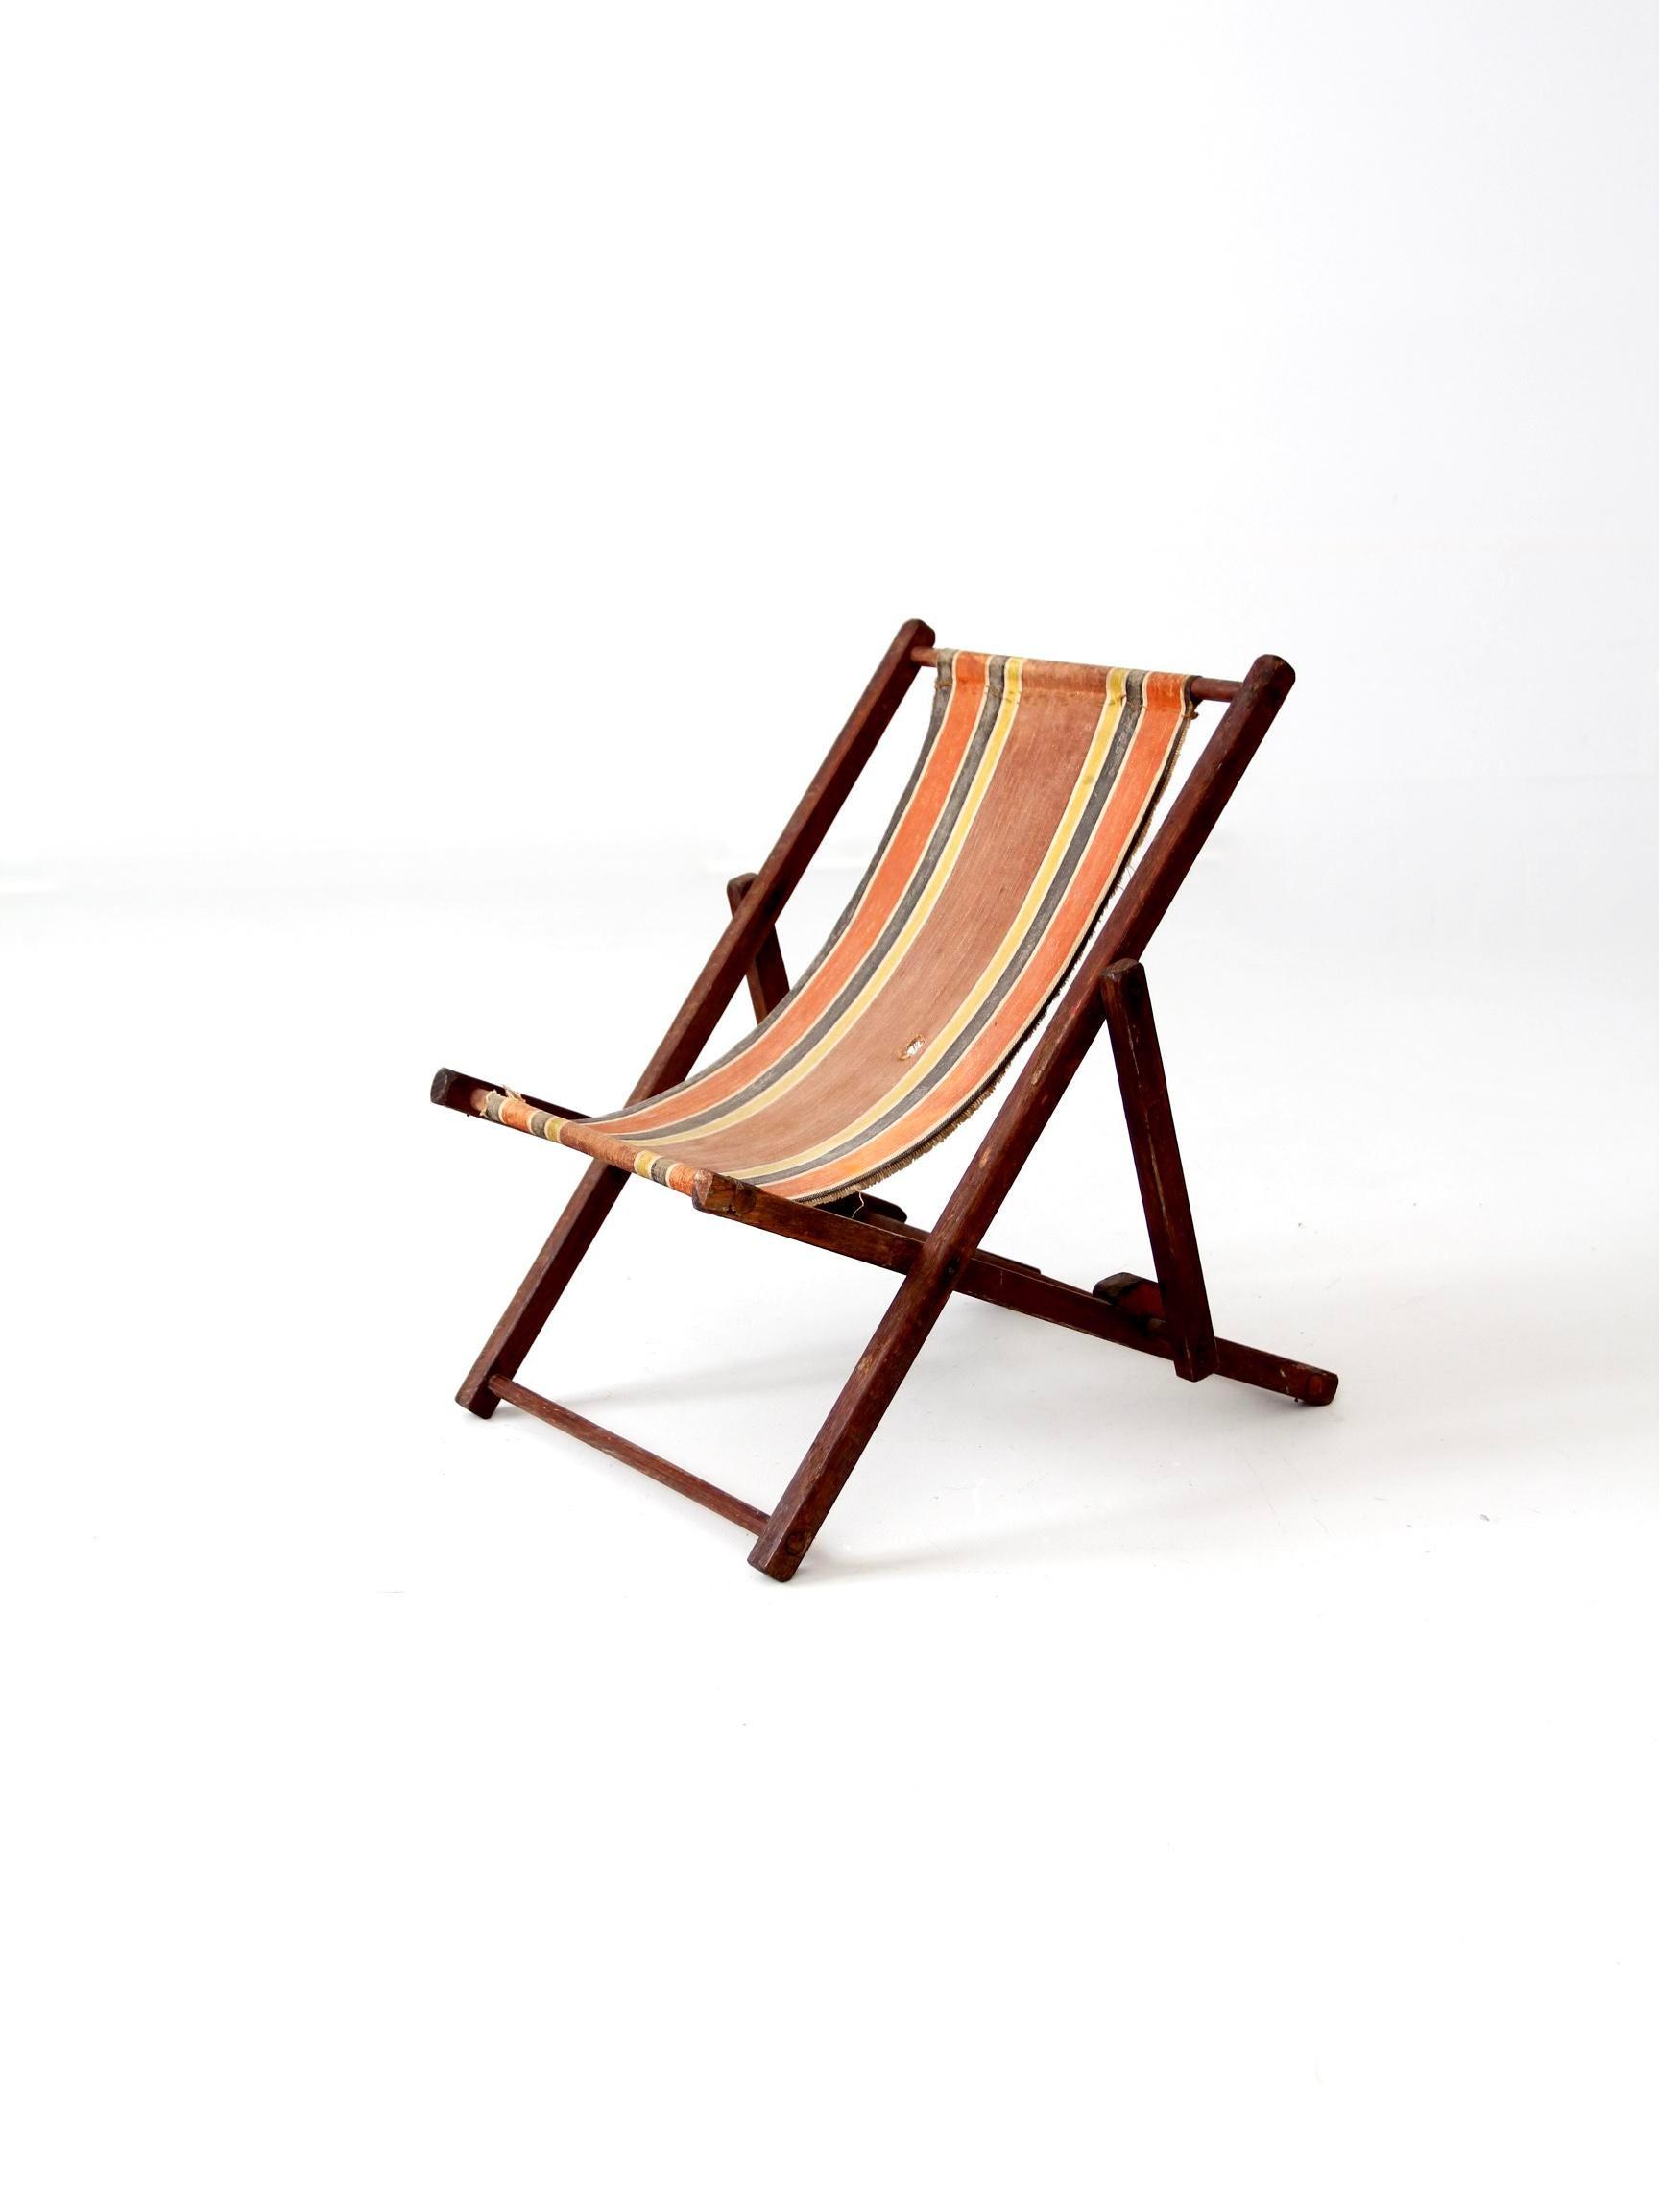 This Is A Childrenu0027s Deck Chair Circa 1940. The Classic Beach Chair  Features A Wood